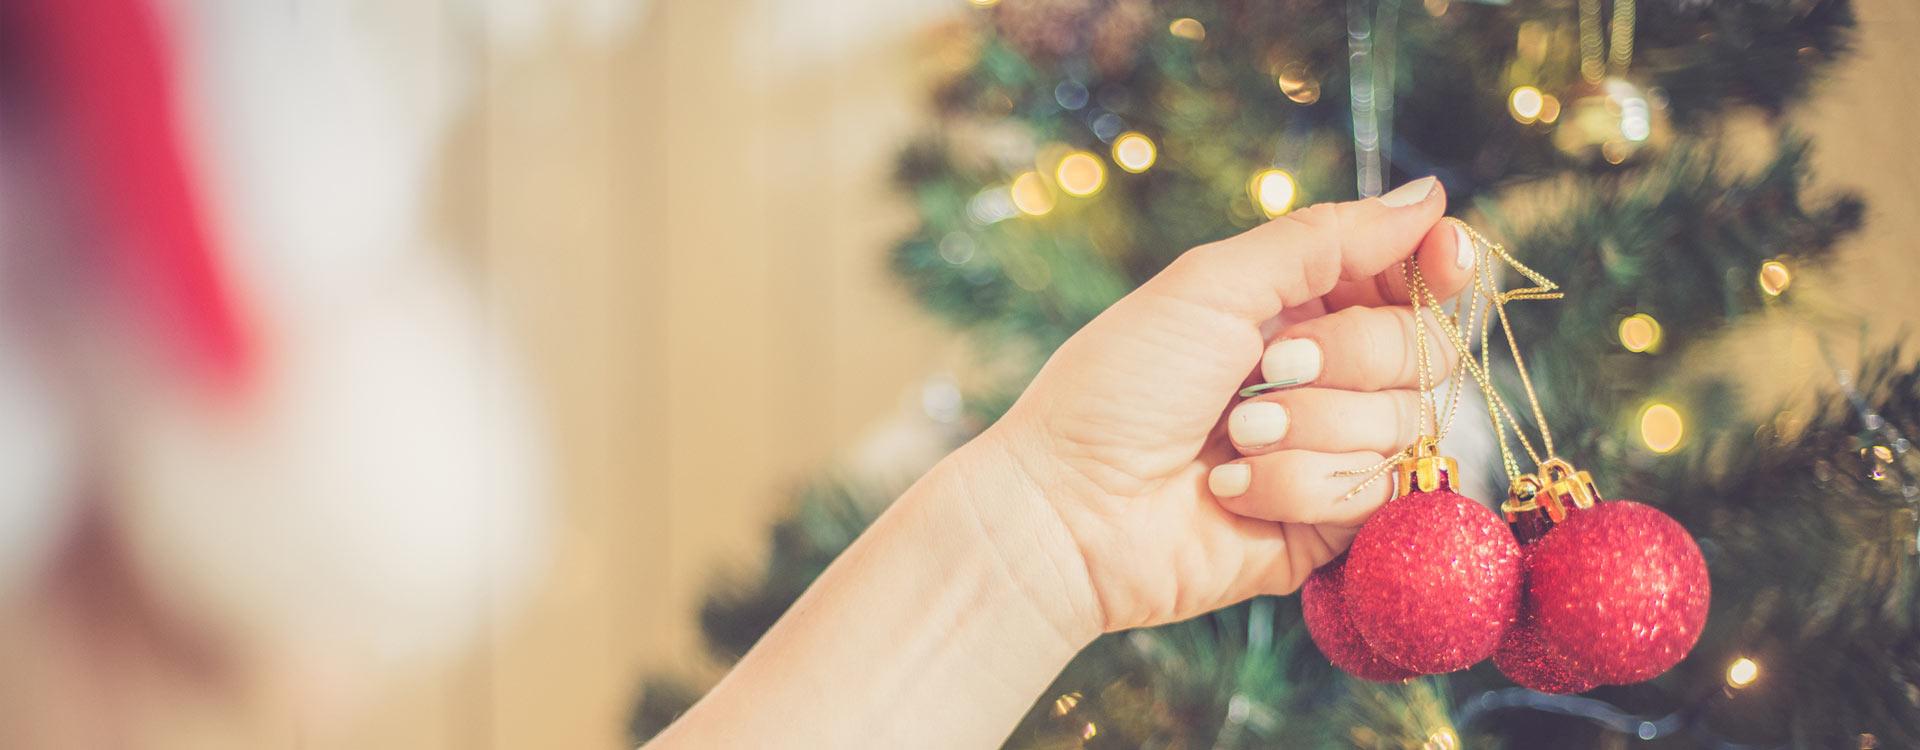 Hang with Us This Holiday Season!